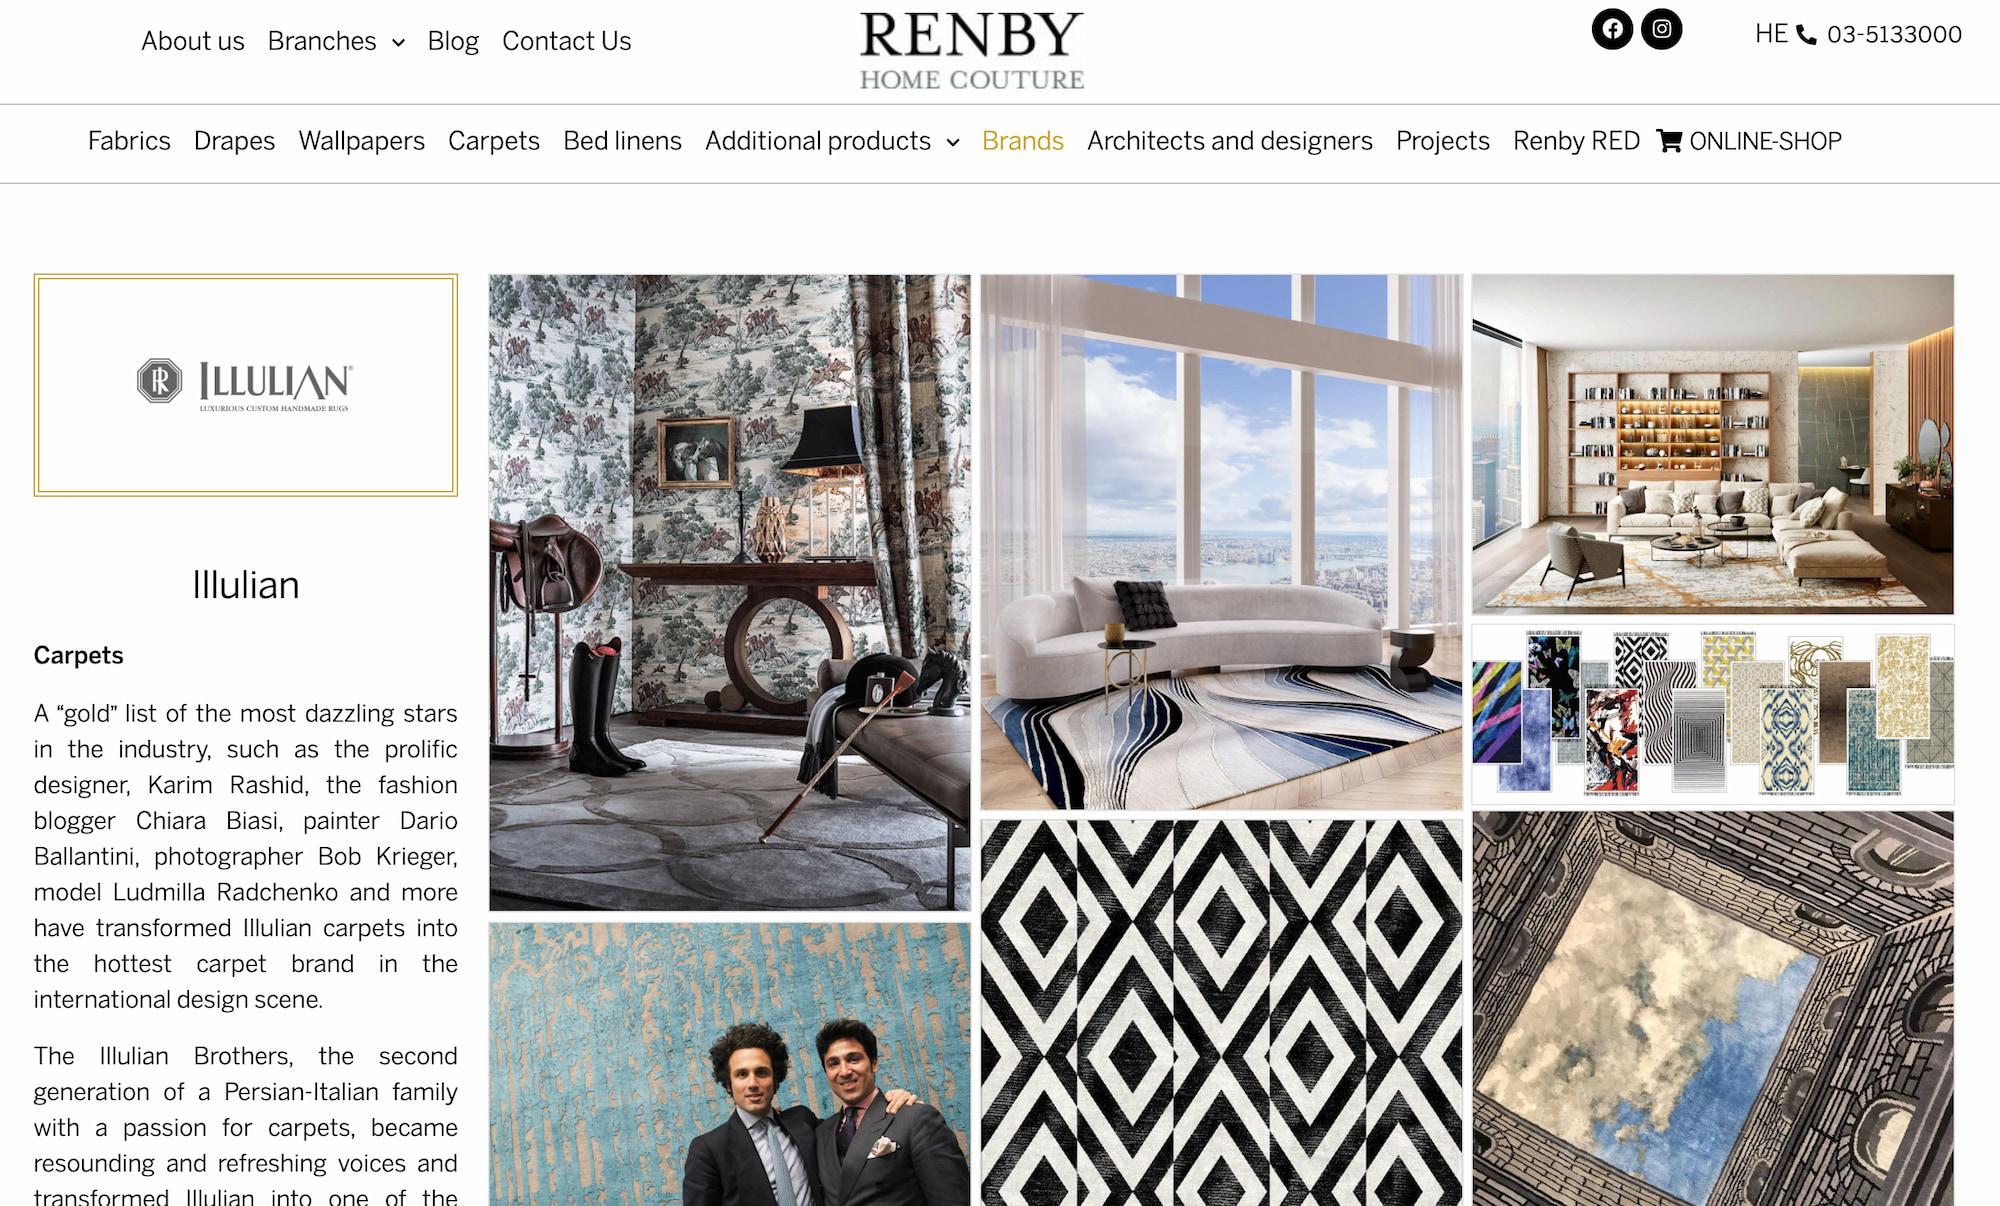 Illulian retailer Renby